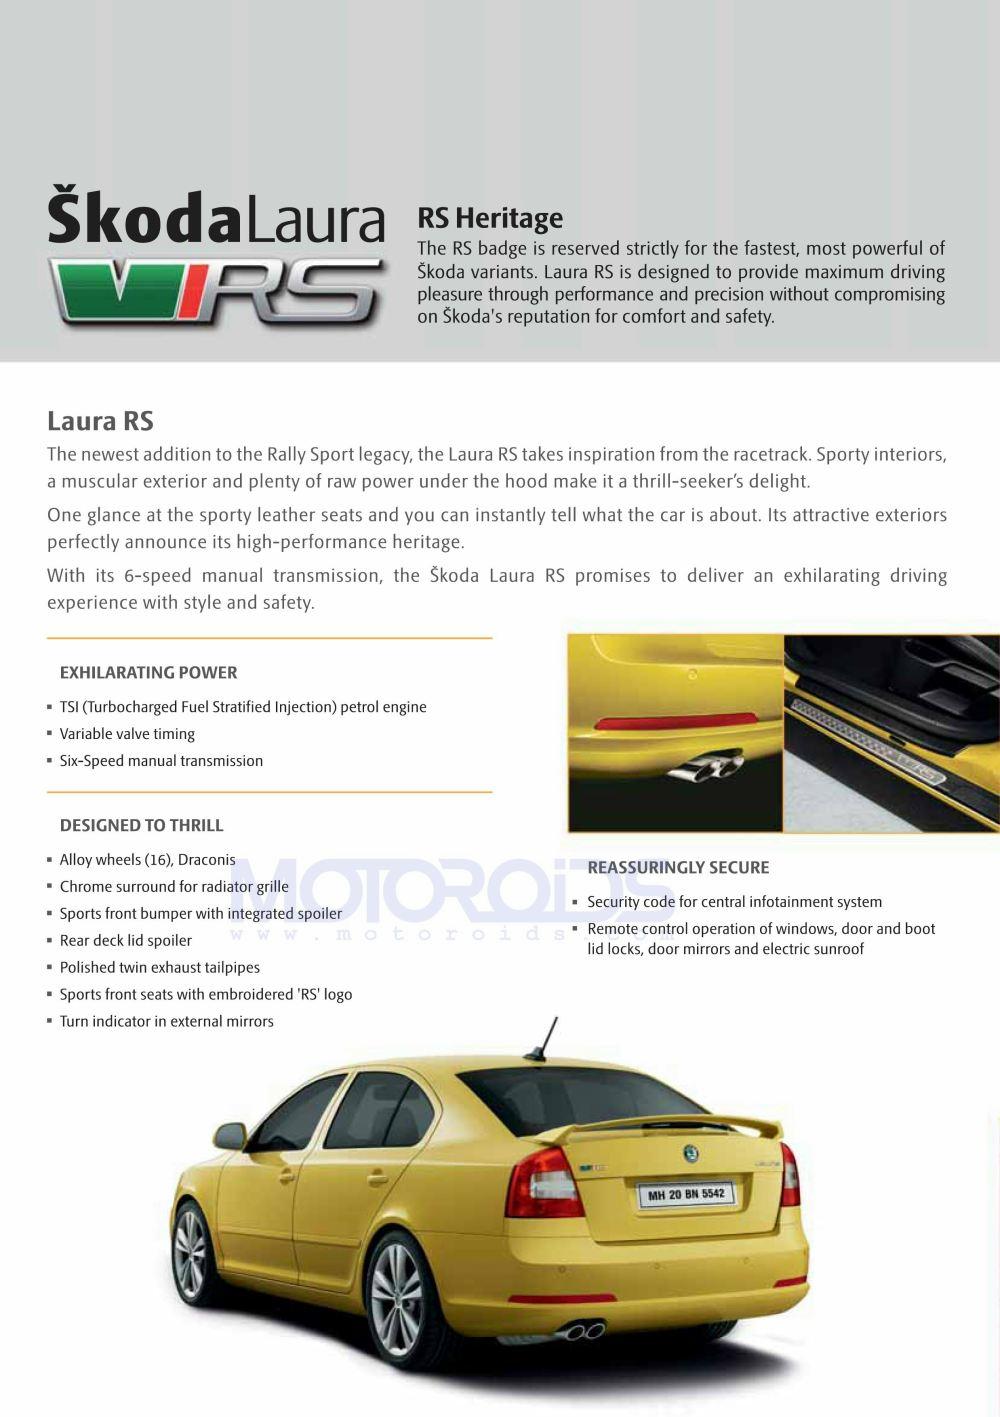 Skoda Laura RS features